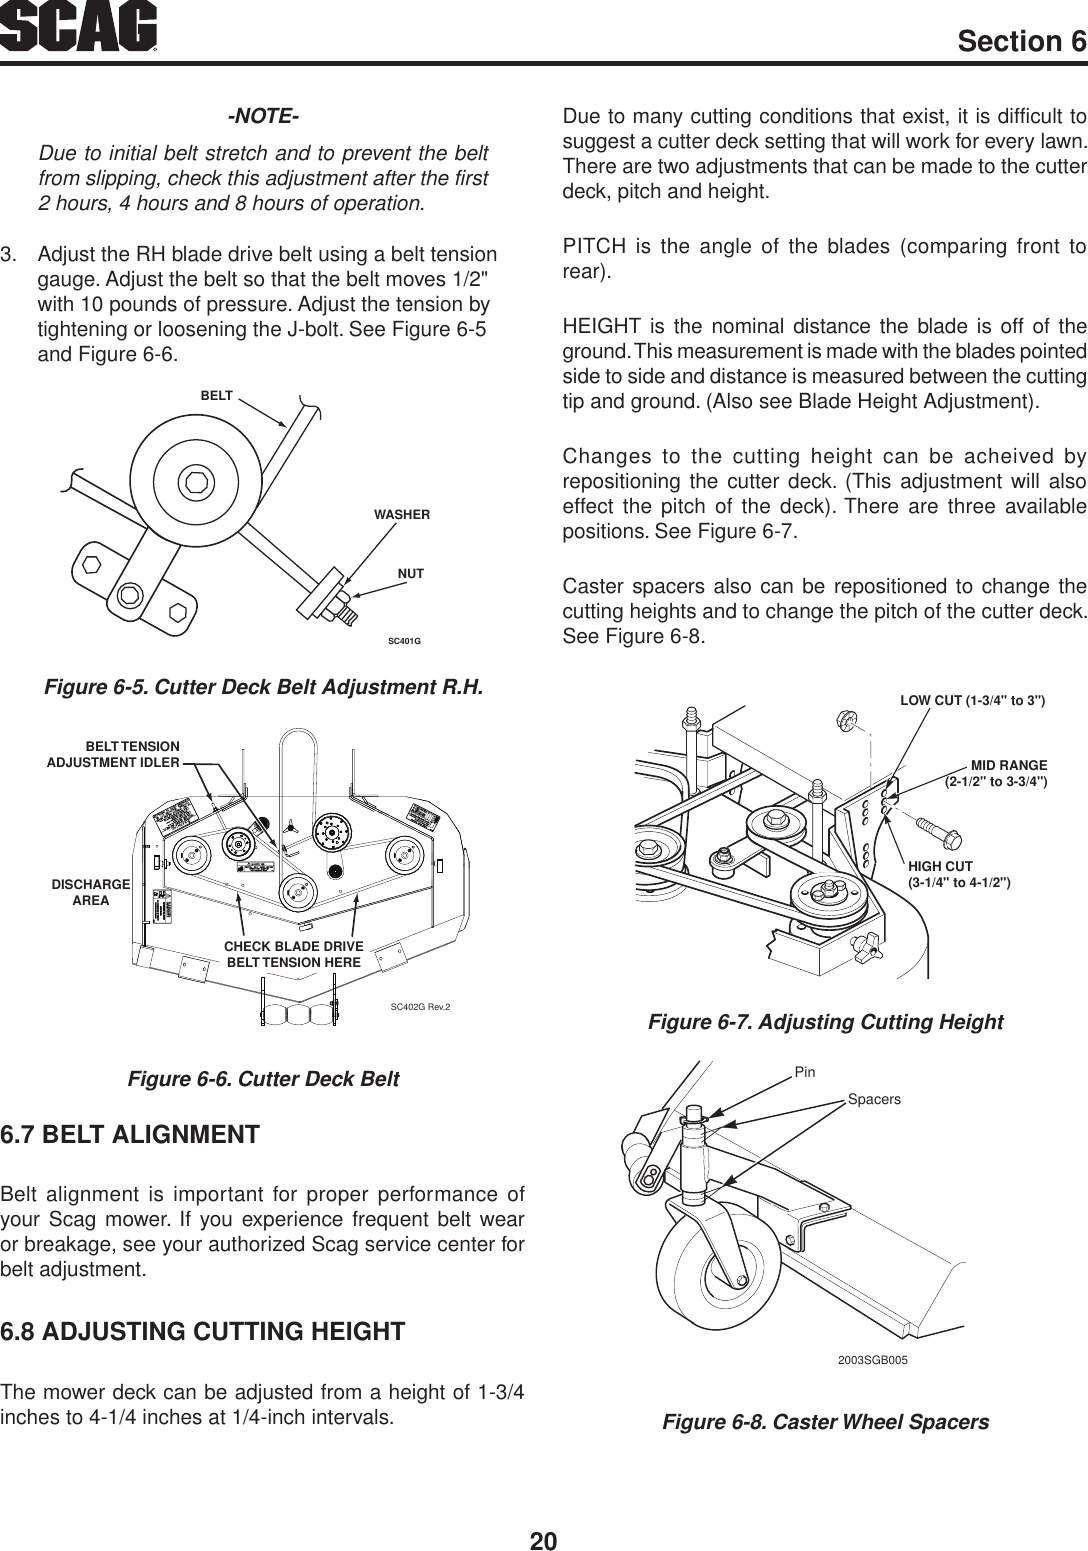 Scag Power Equipment Walk Behind Swz 19Kai Users Manual